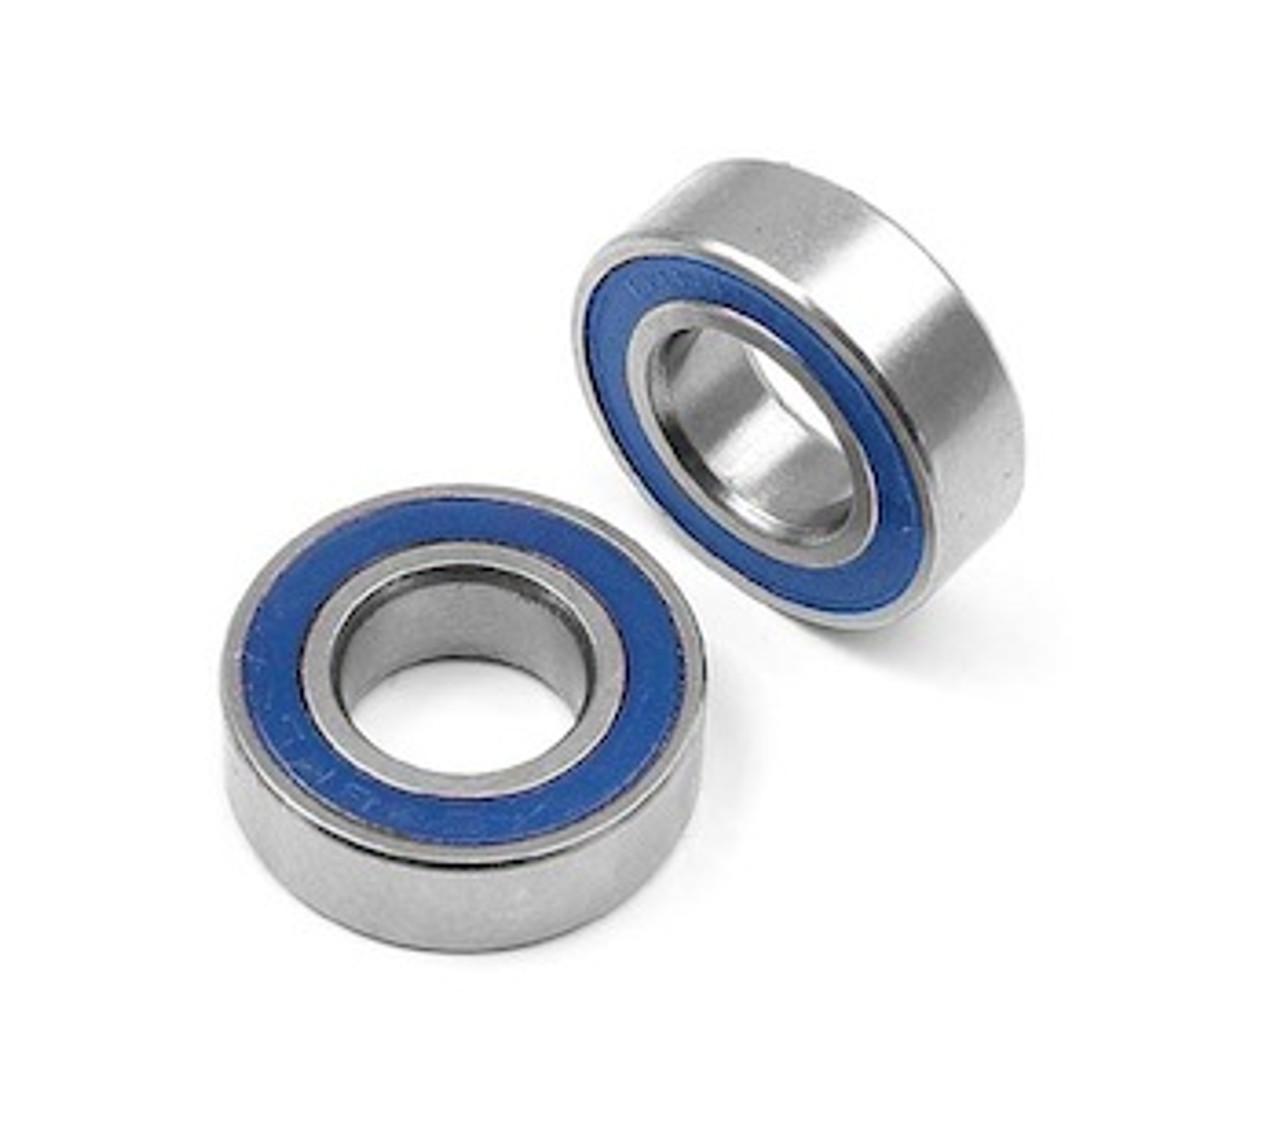 Bearings Metric Series 20x27x4 MM Rubber Sealed (2 Pack) (6704 2RS)